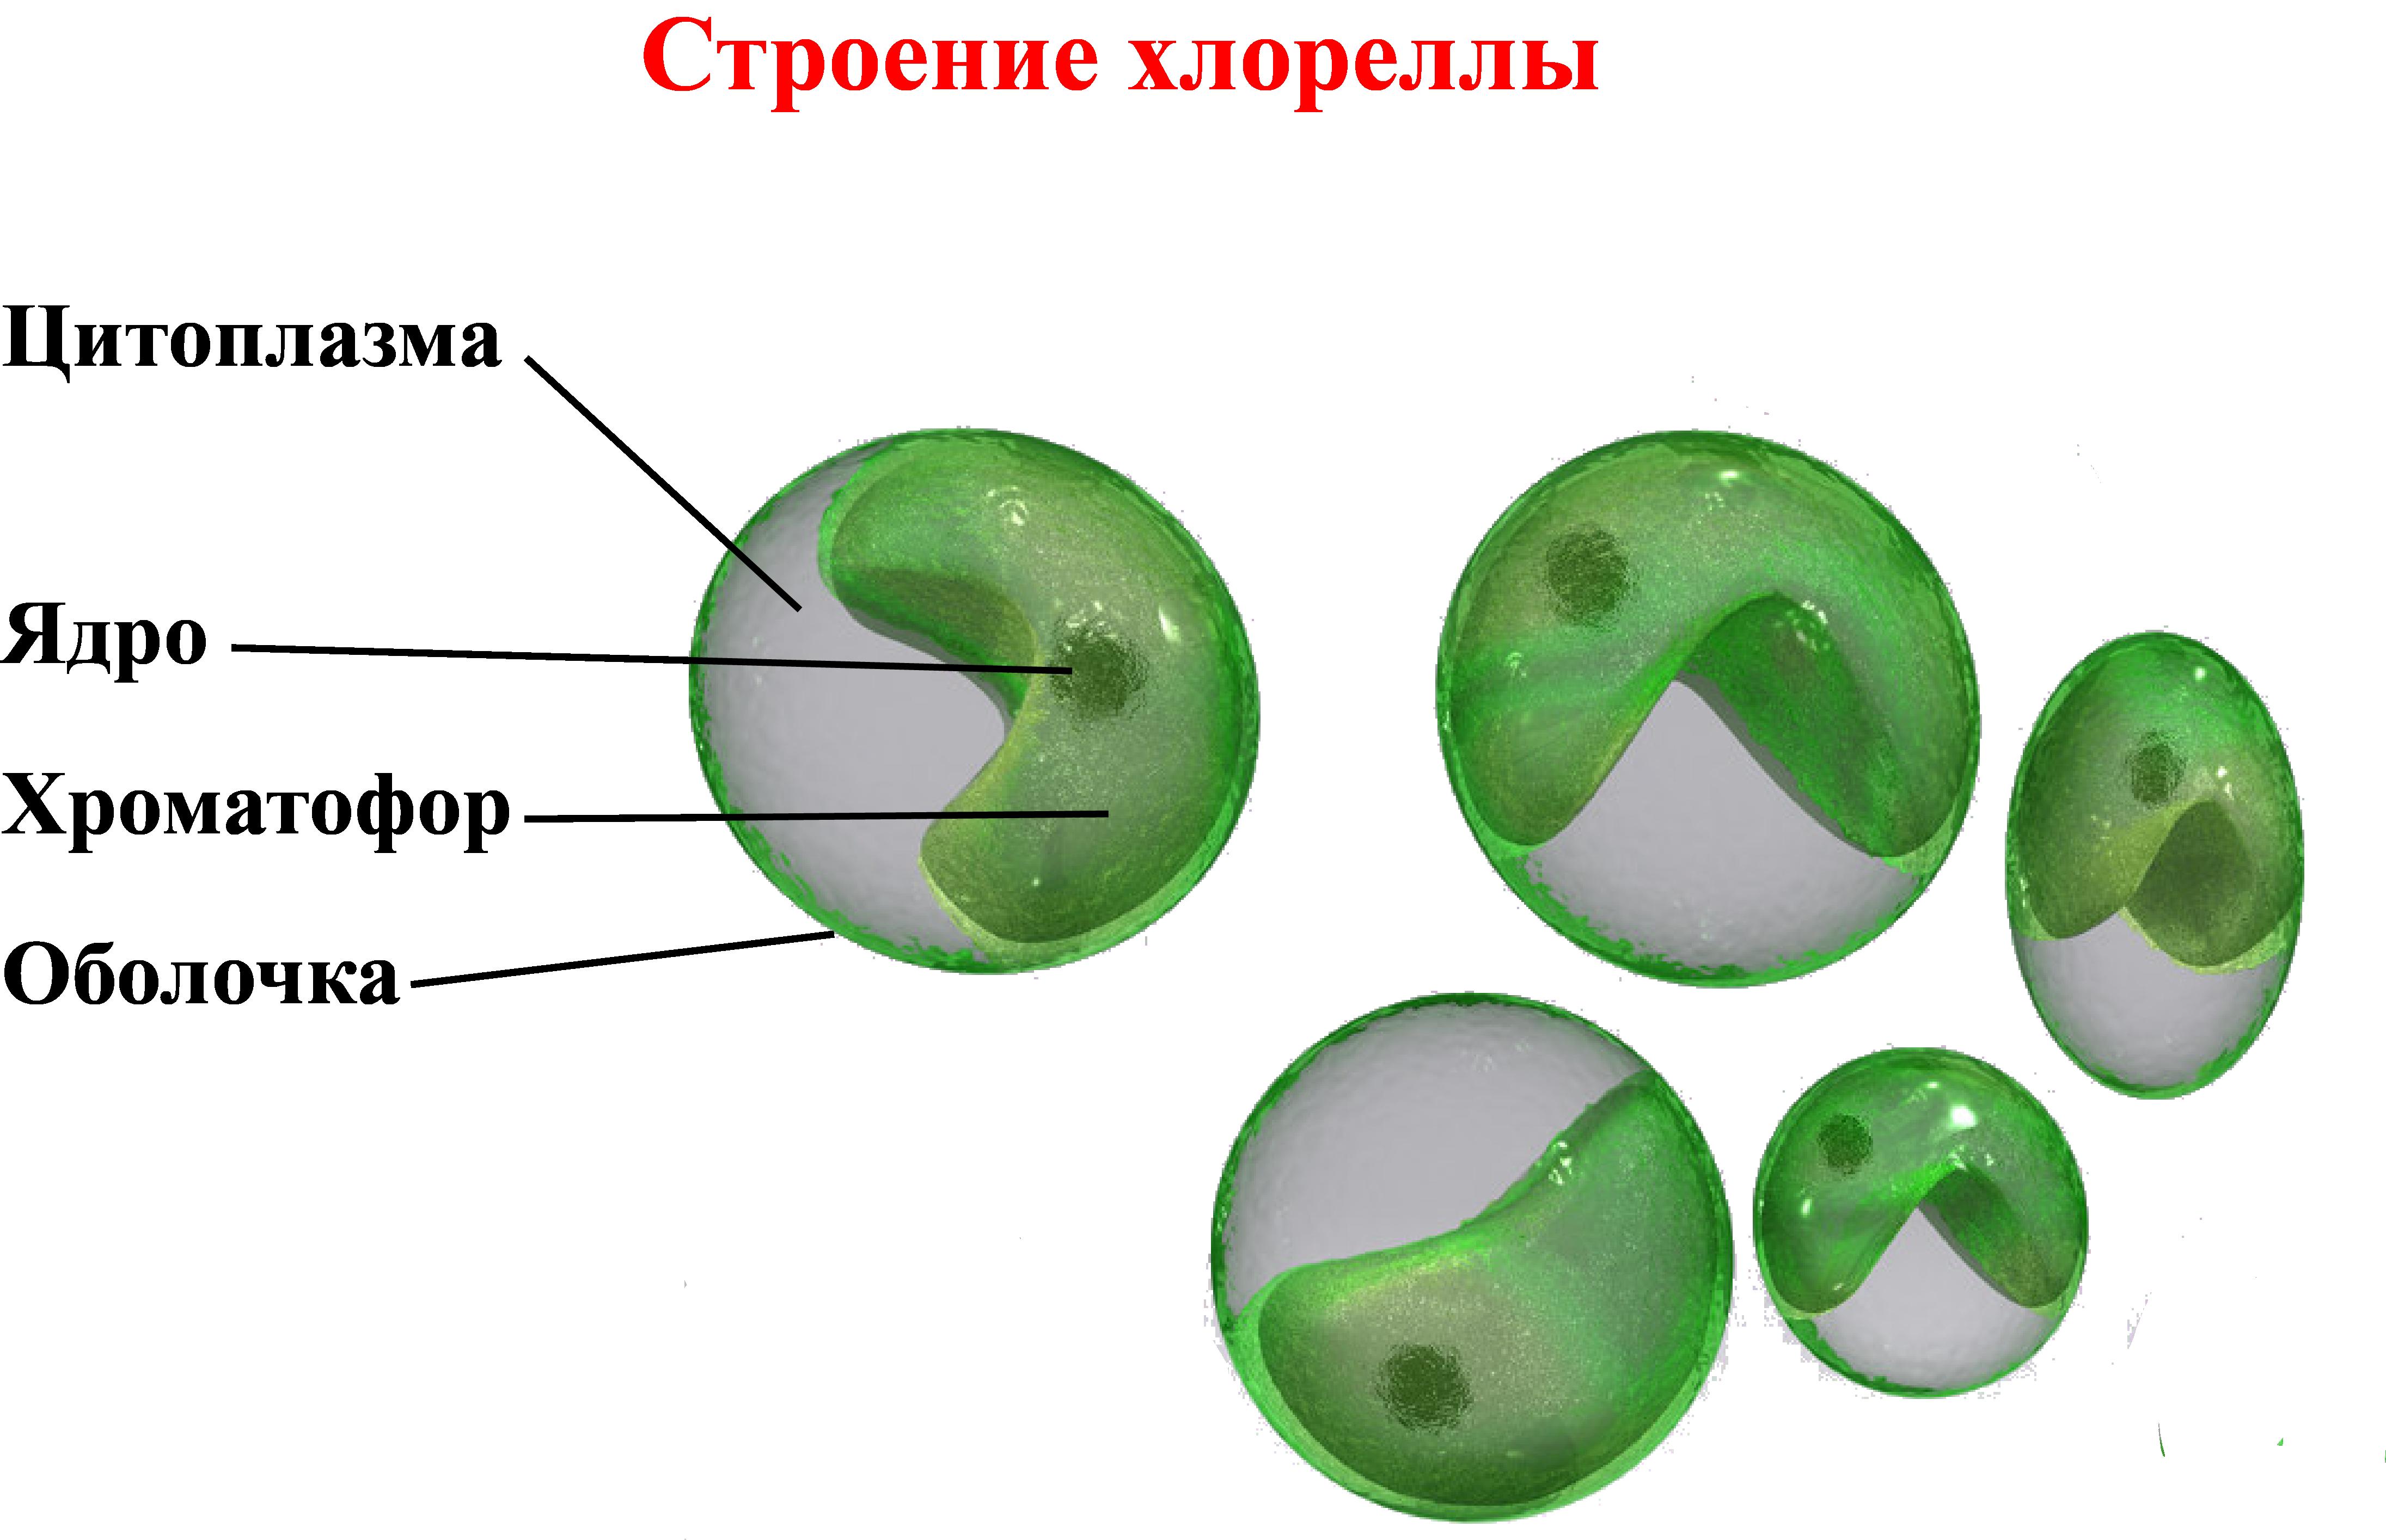 хлорелла